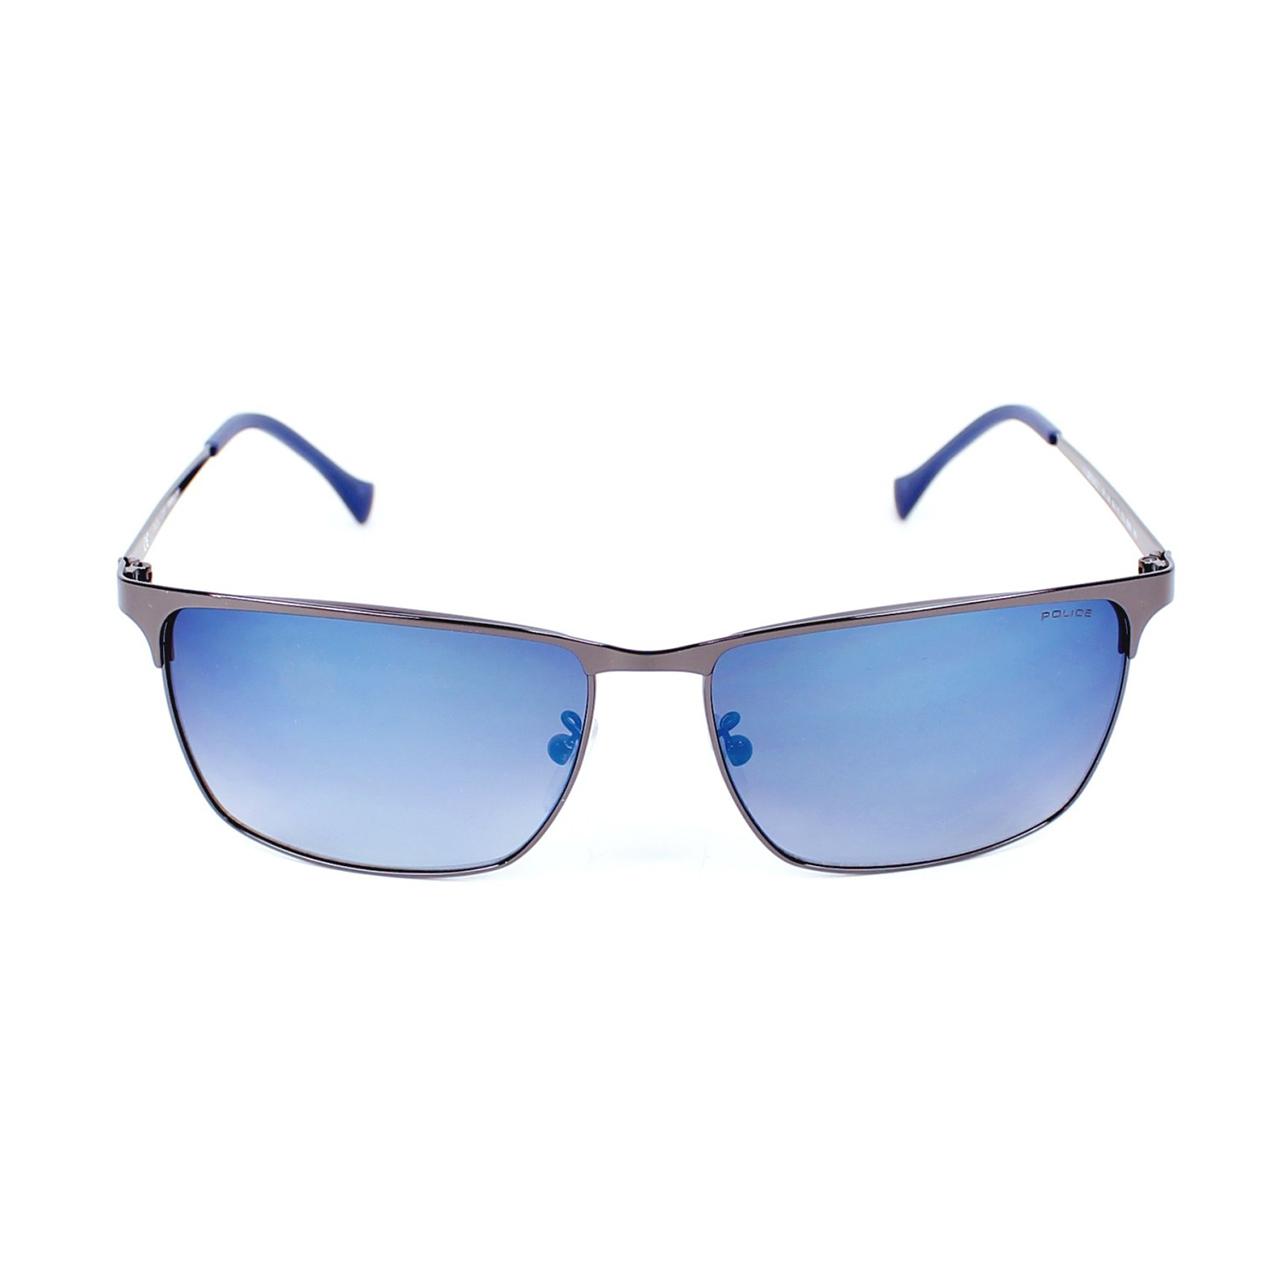 عینک آفتابی پلیس مدل SPL 146 COL 568B